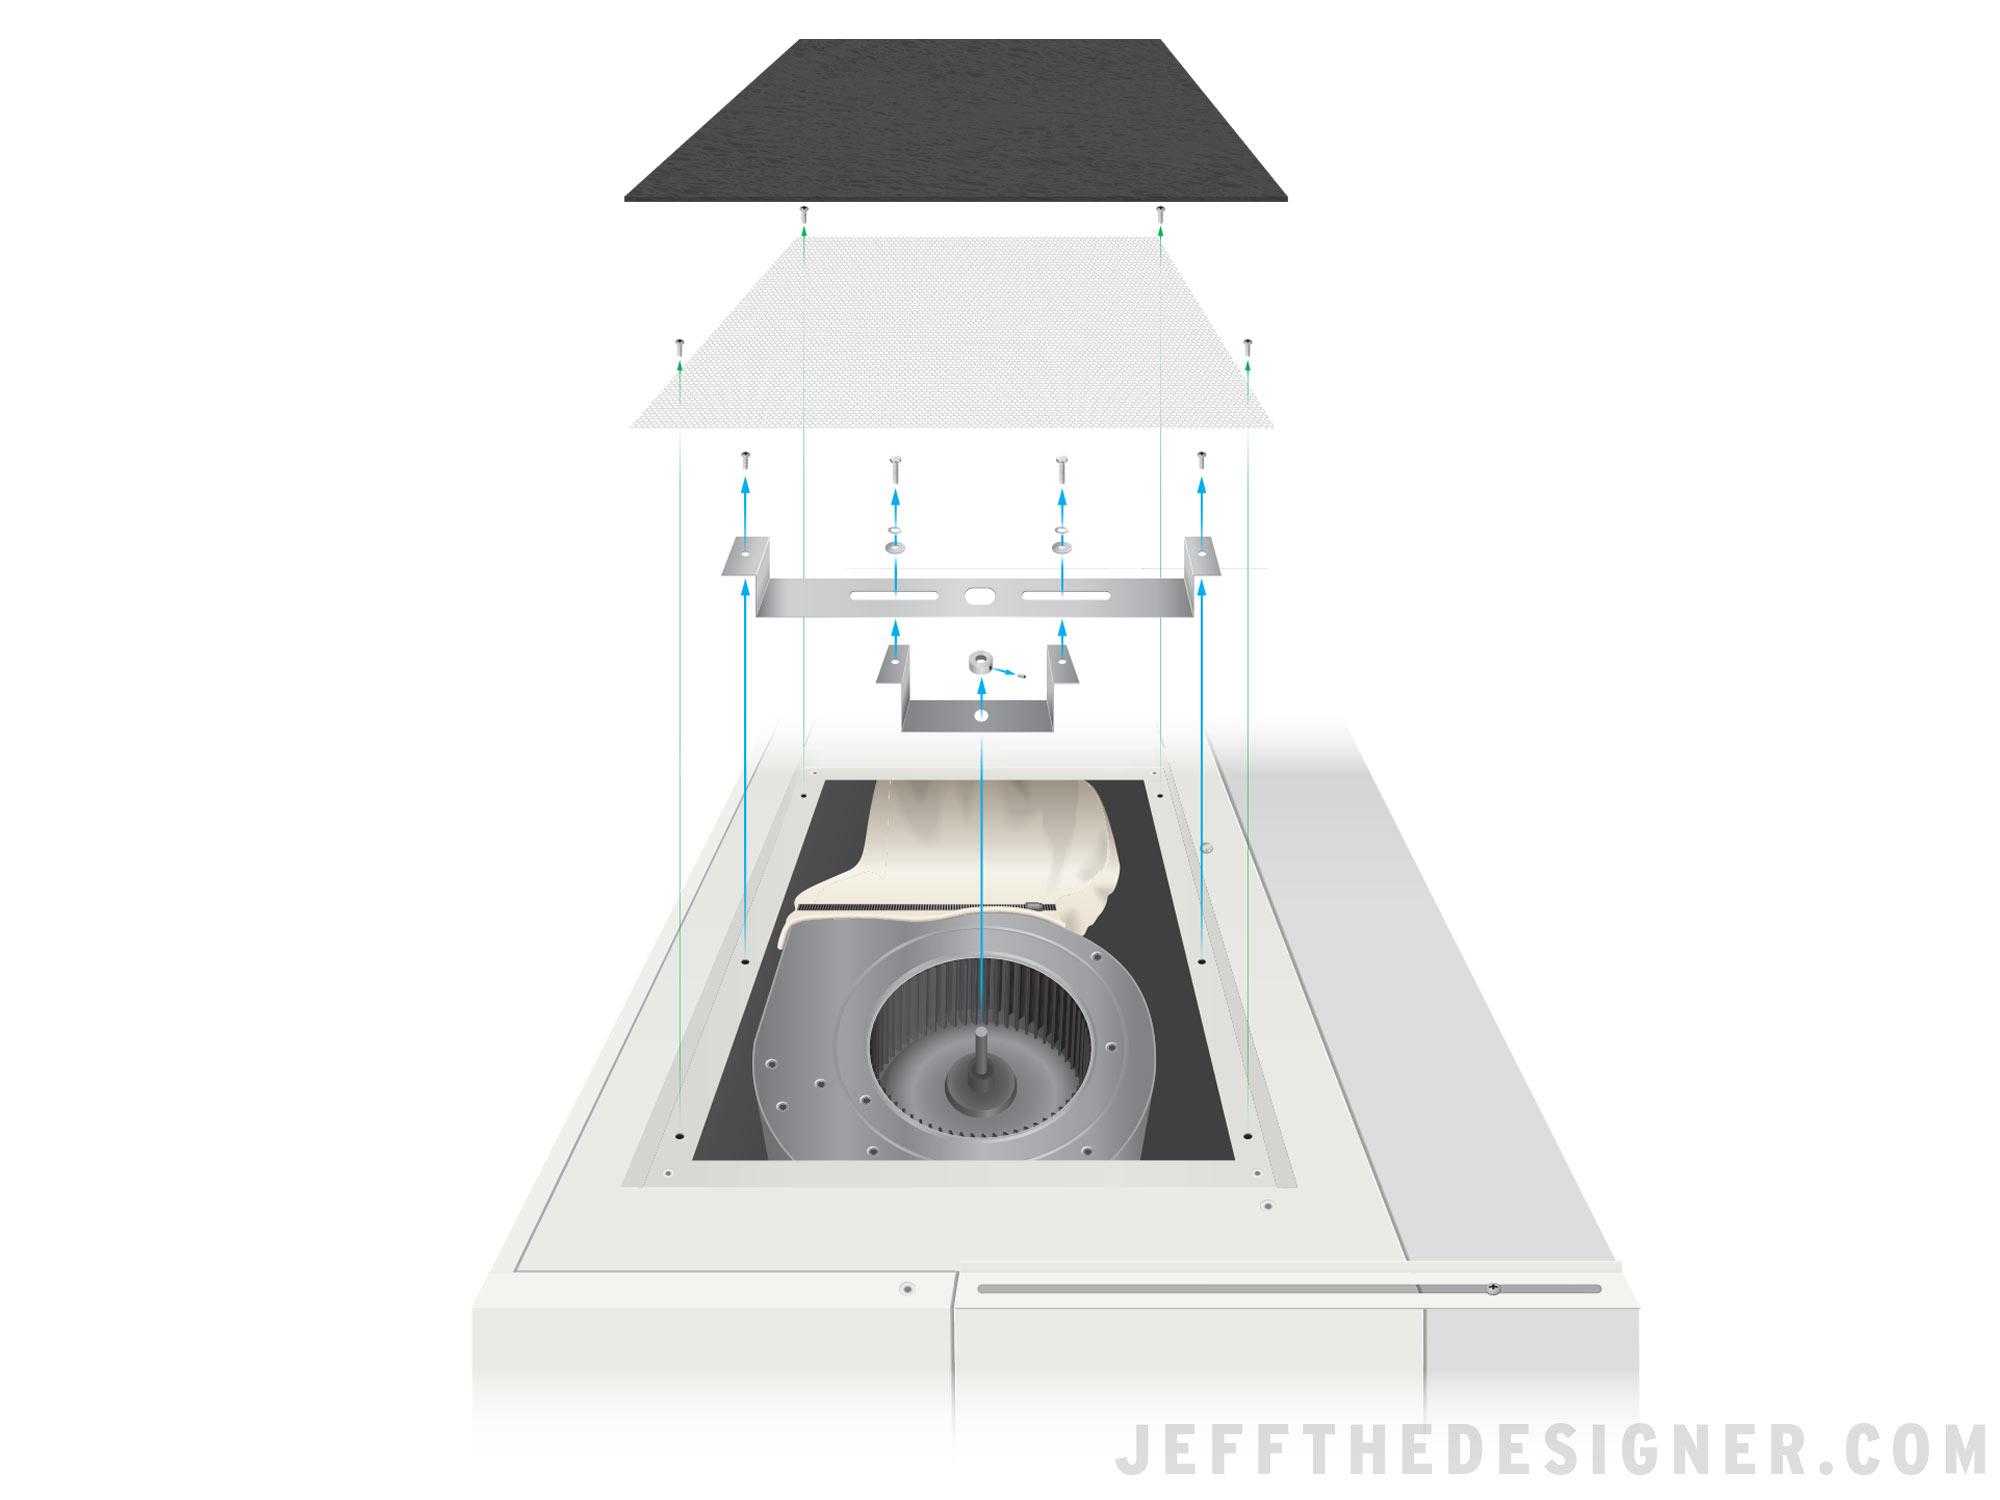 Laboratory Equipment Disassembly Illustration